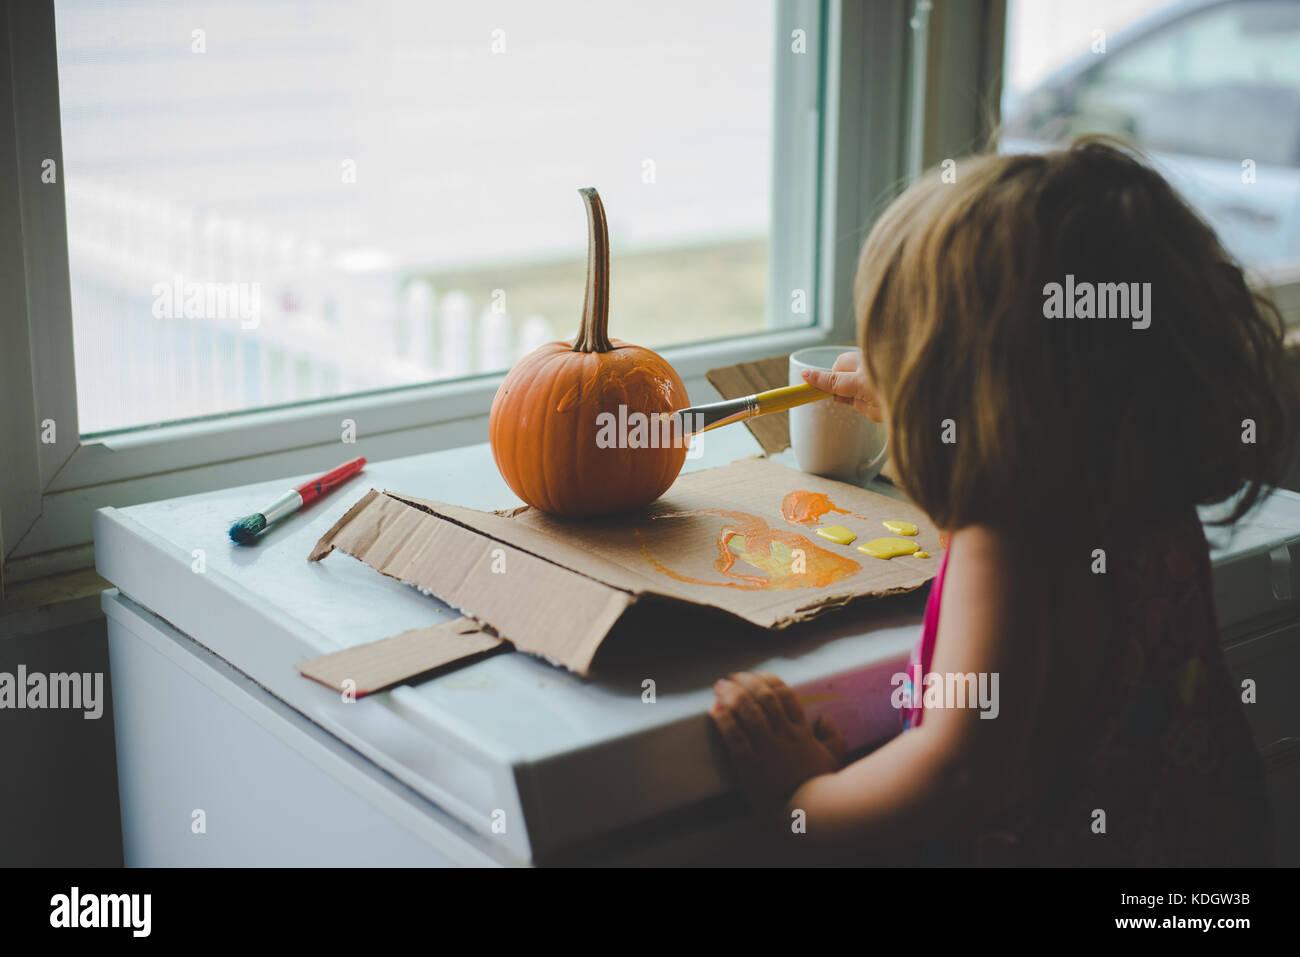 A little girl paints pumpkins during autumn activities. - Stock Image